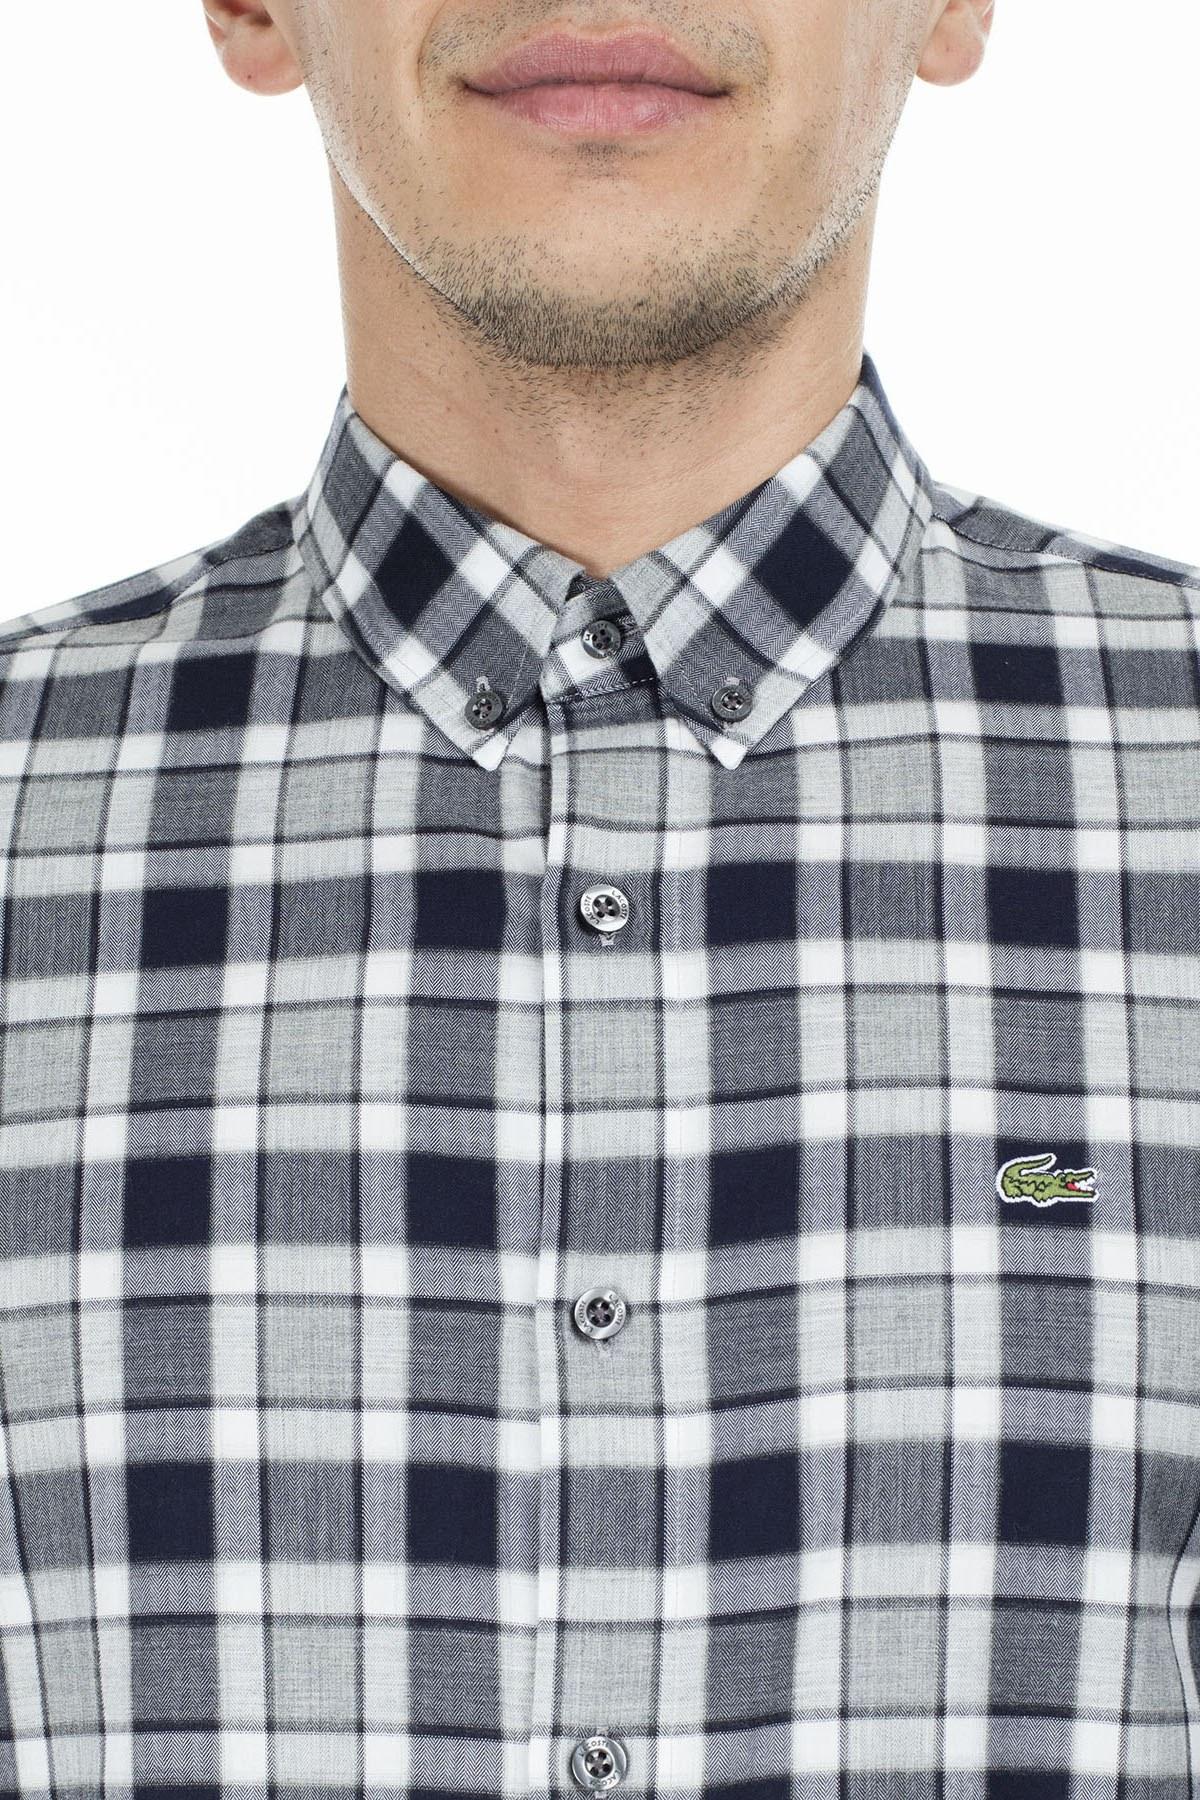 Lacoste Slim Fit Ekose Desenli Erkek Gömlek CH2021 21G GRİ